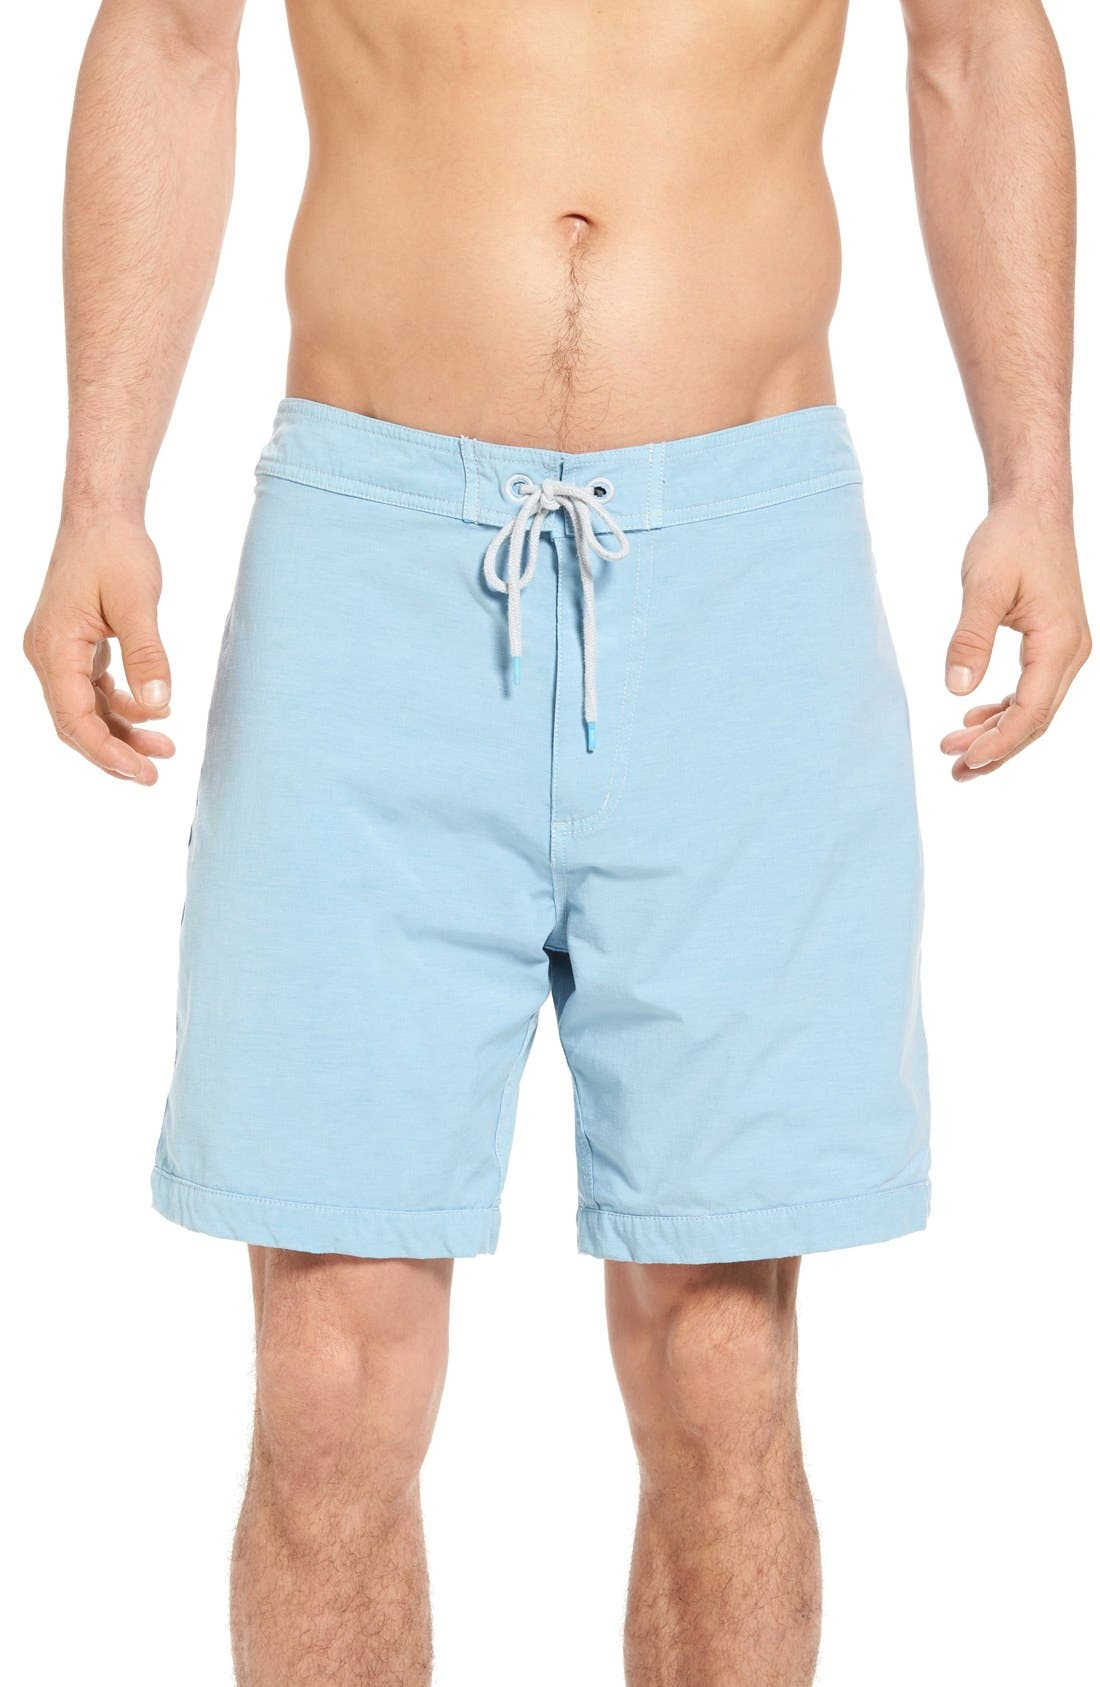 Venice Board Shorts,                         Main,                         color, Light Blue